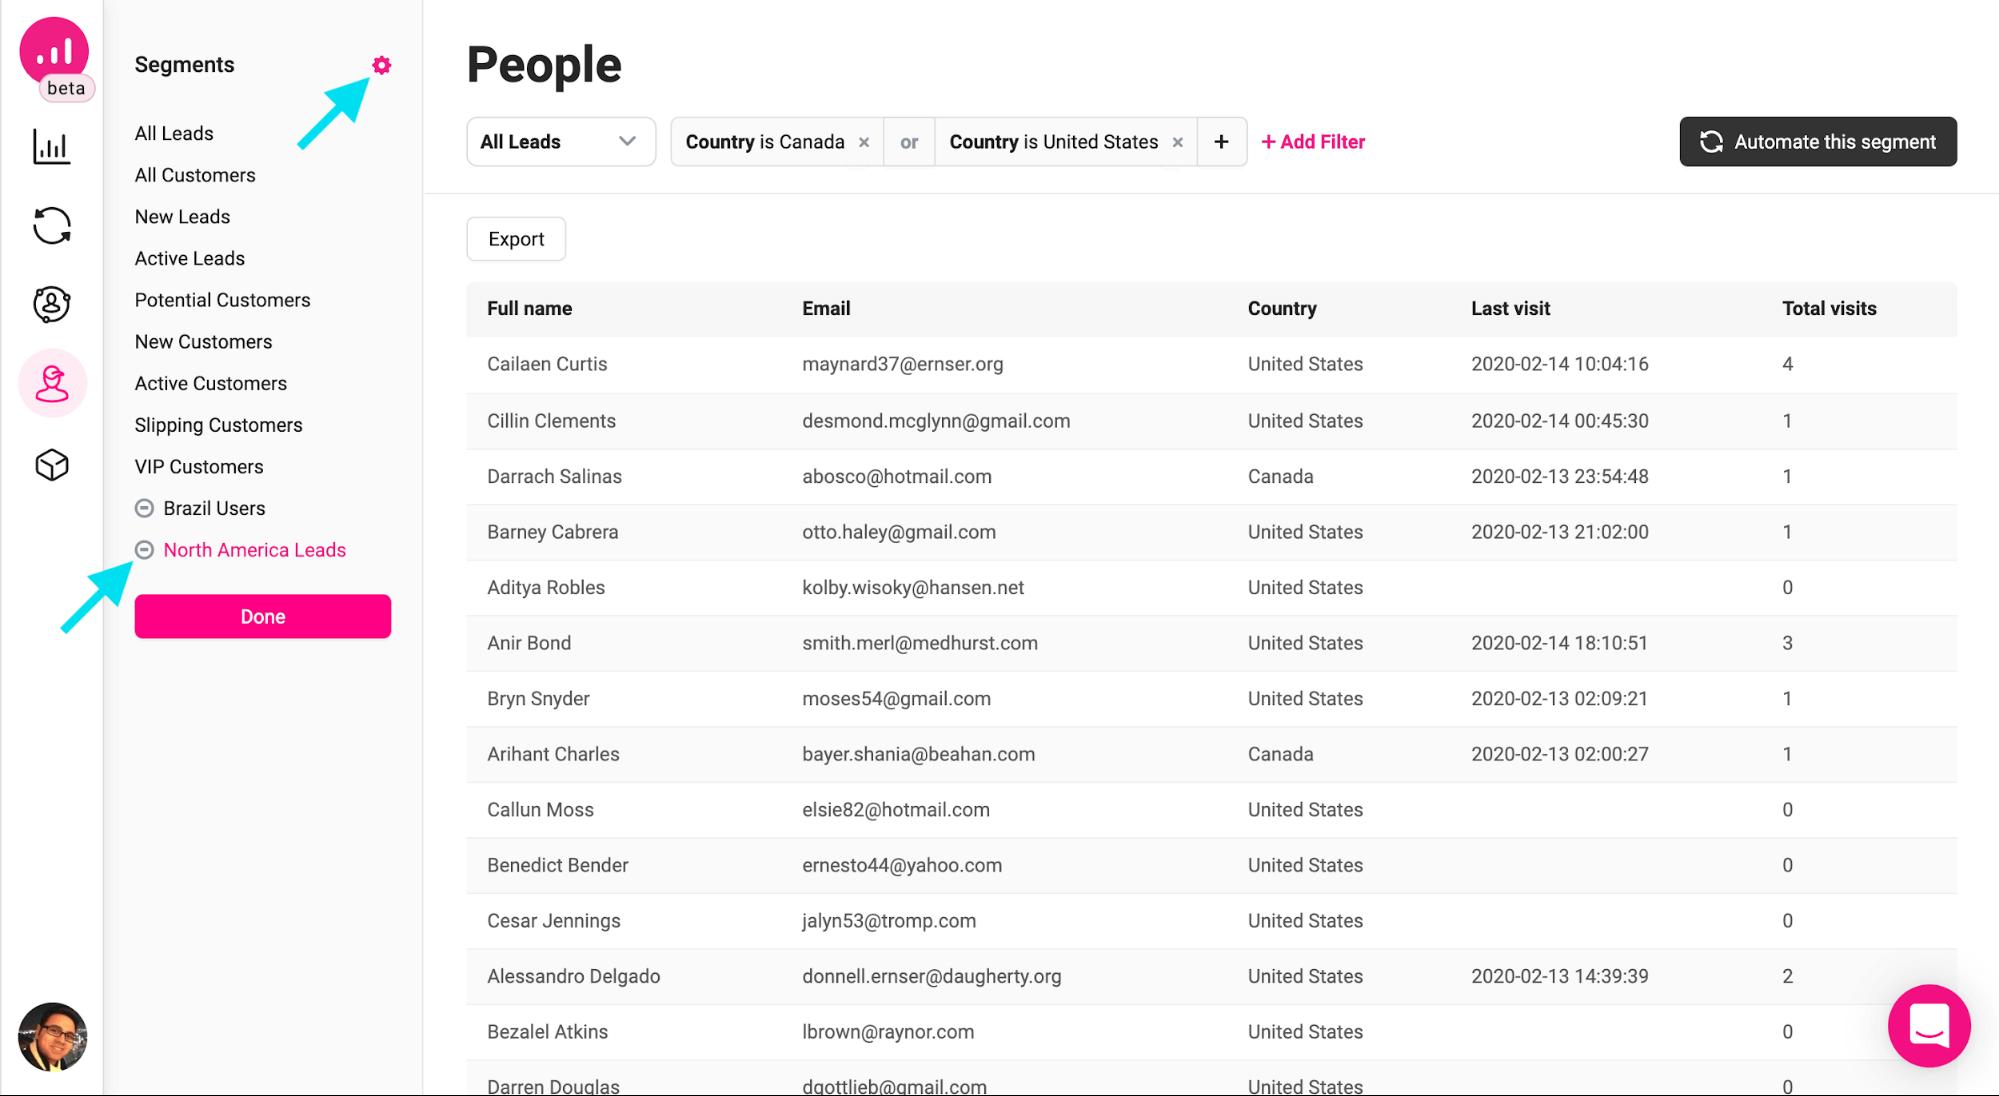 people - deleting custom segment